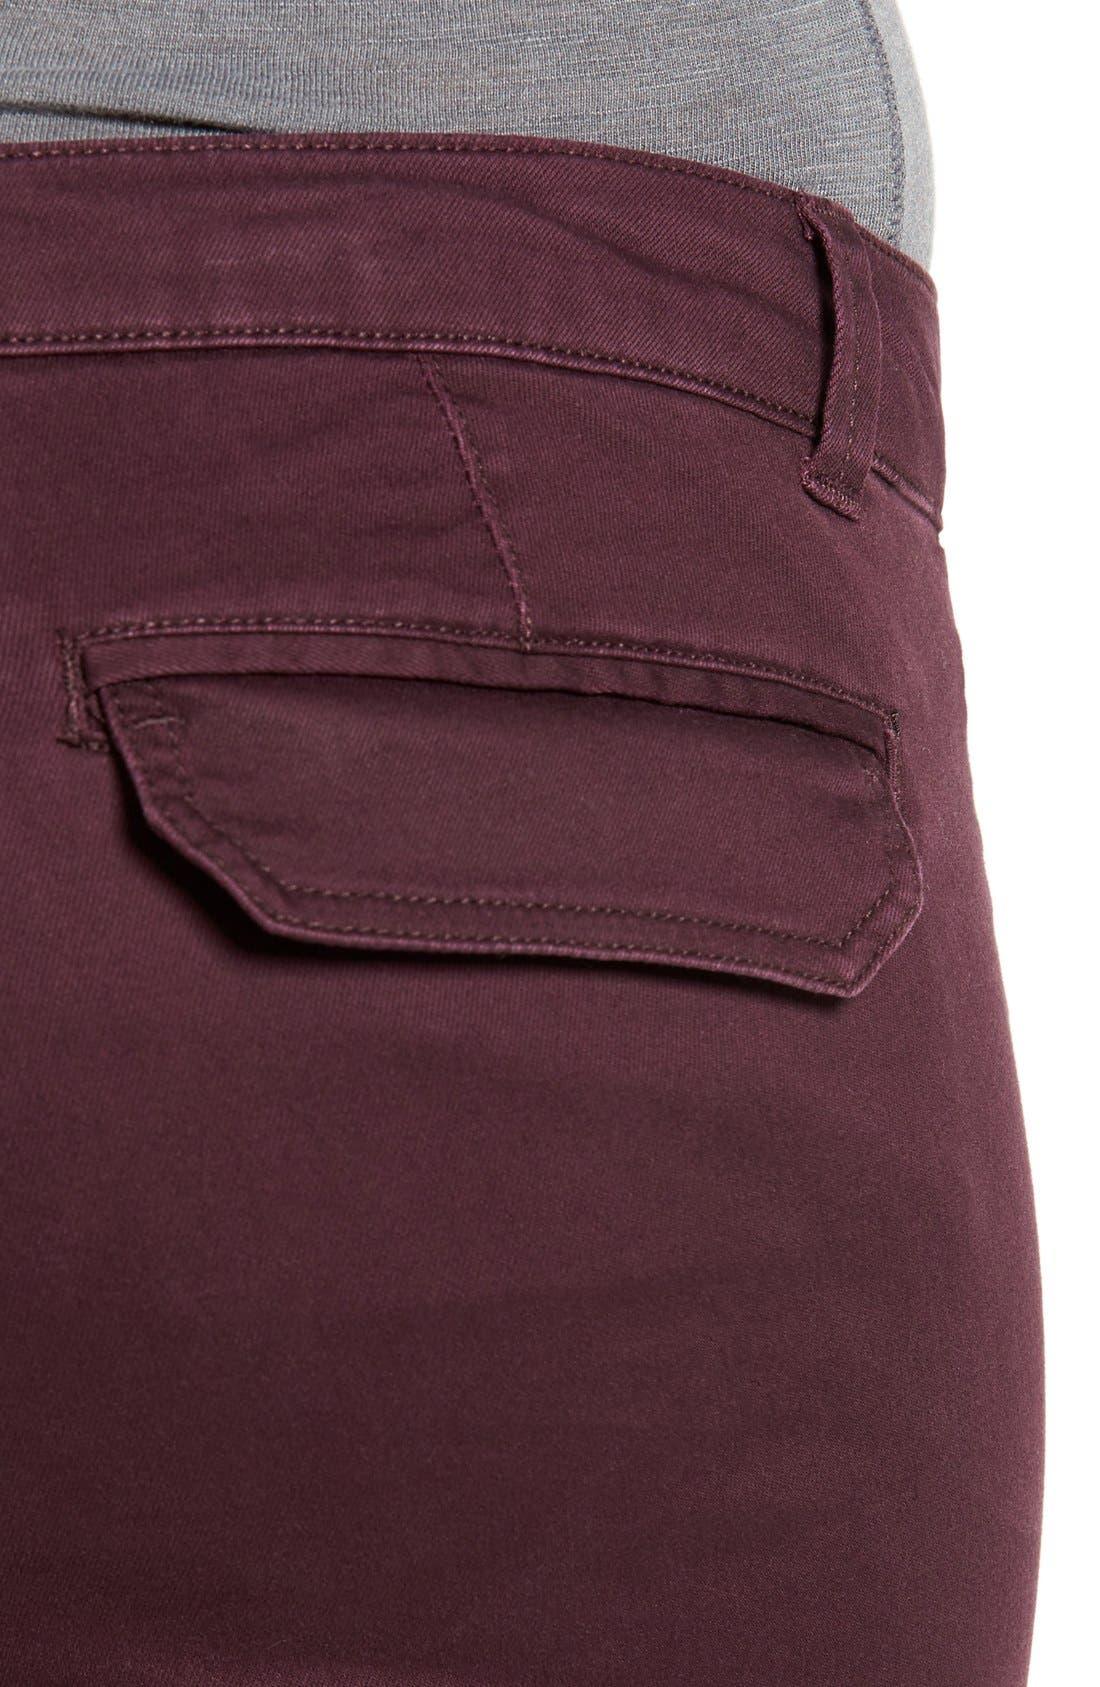 Skinny Cargo Pants,                             Alternate thumbnail 53, color,